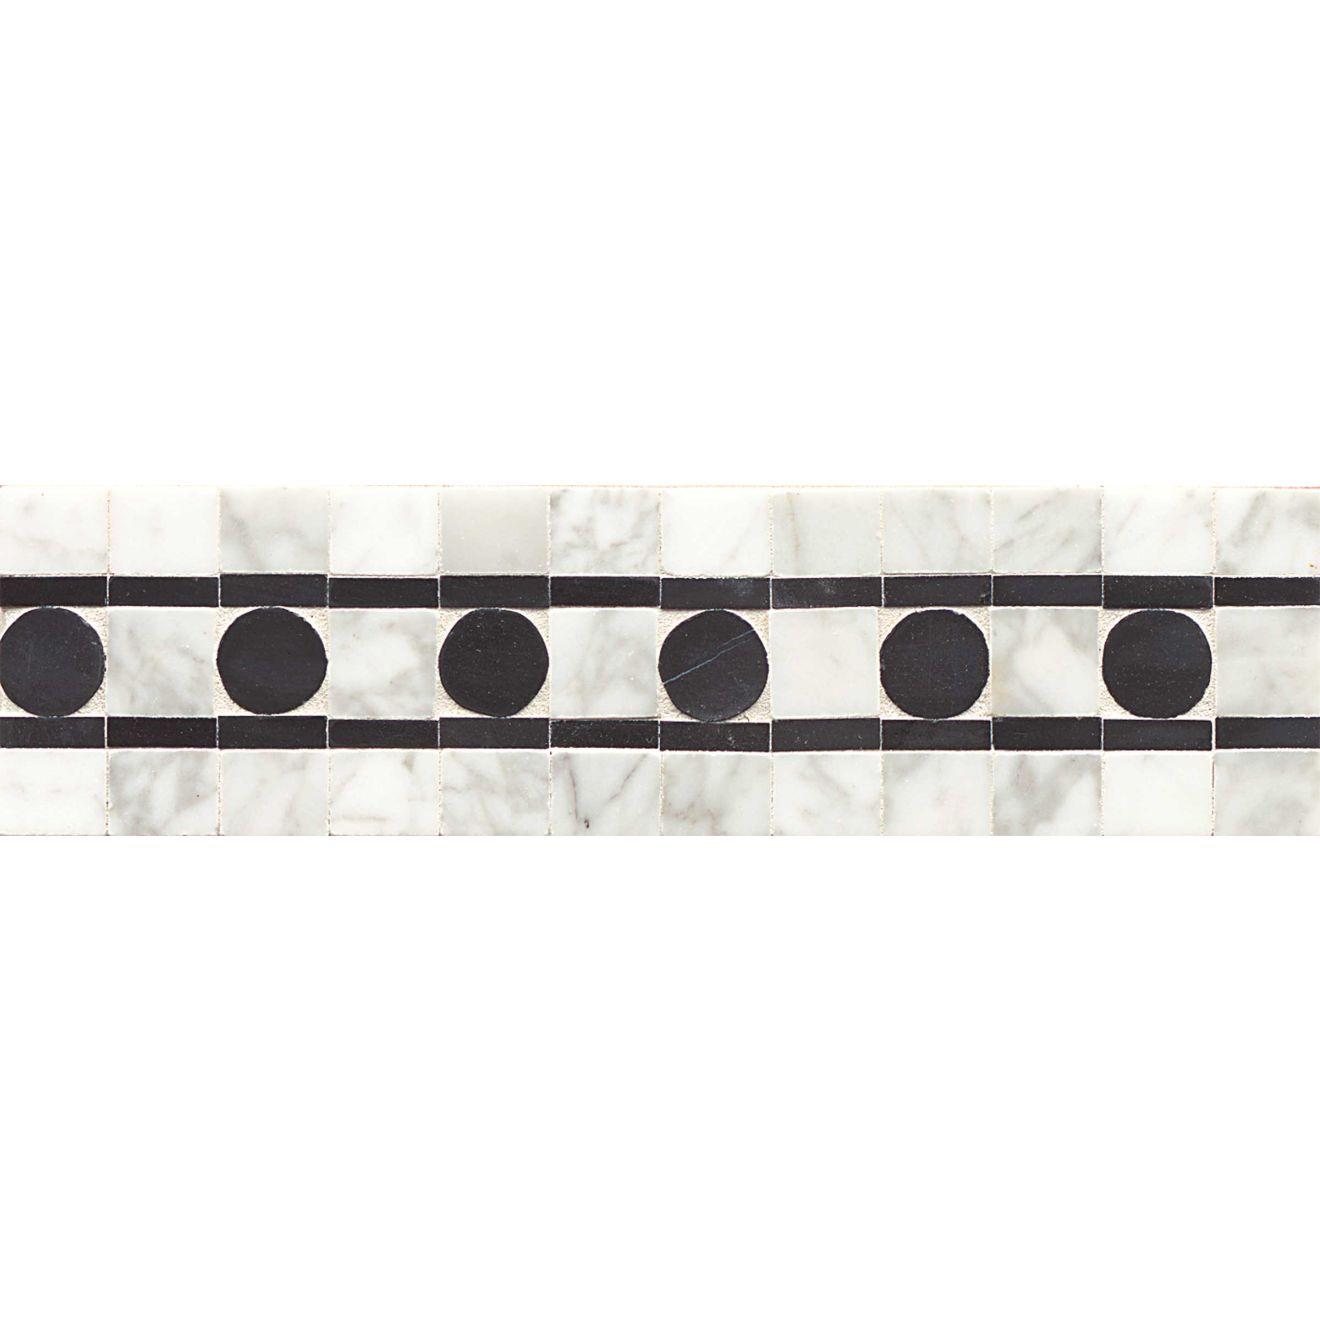 3X12 Liner Sqre Peg-Wh Carre/Ebony